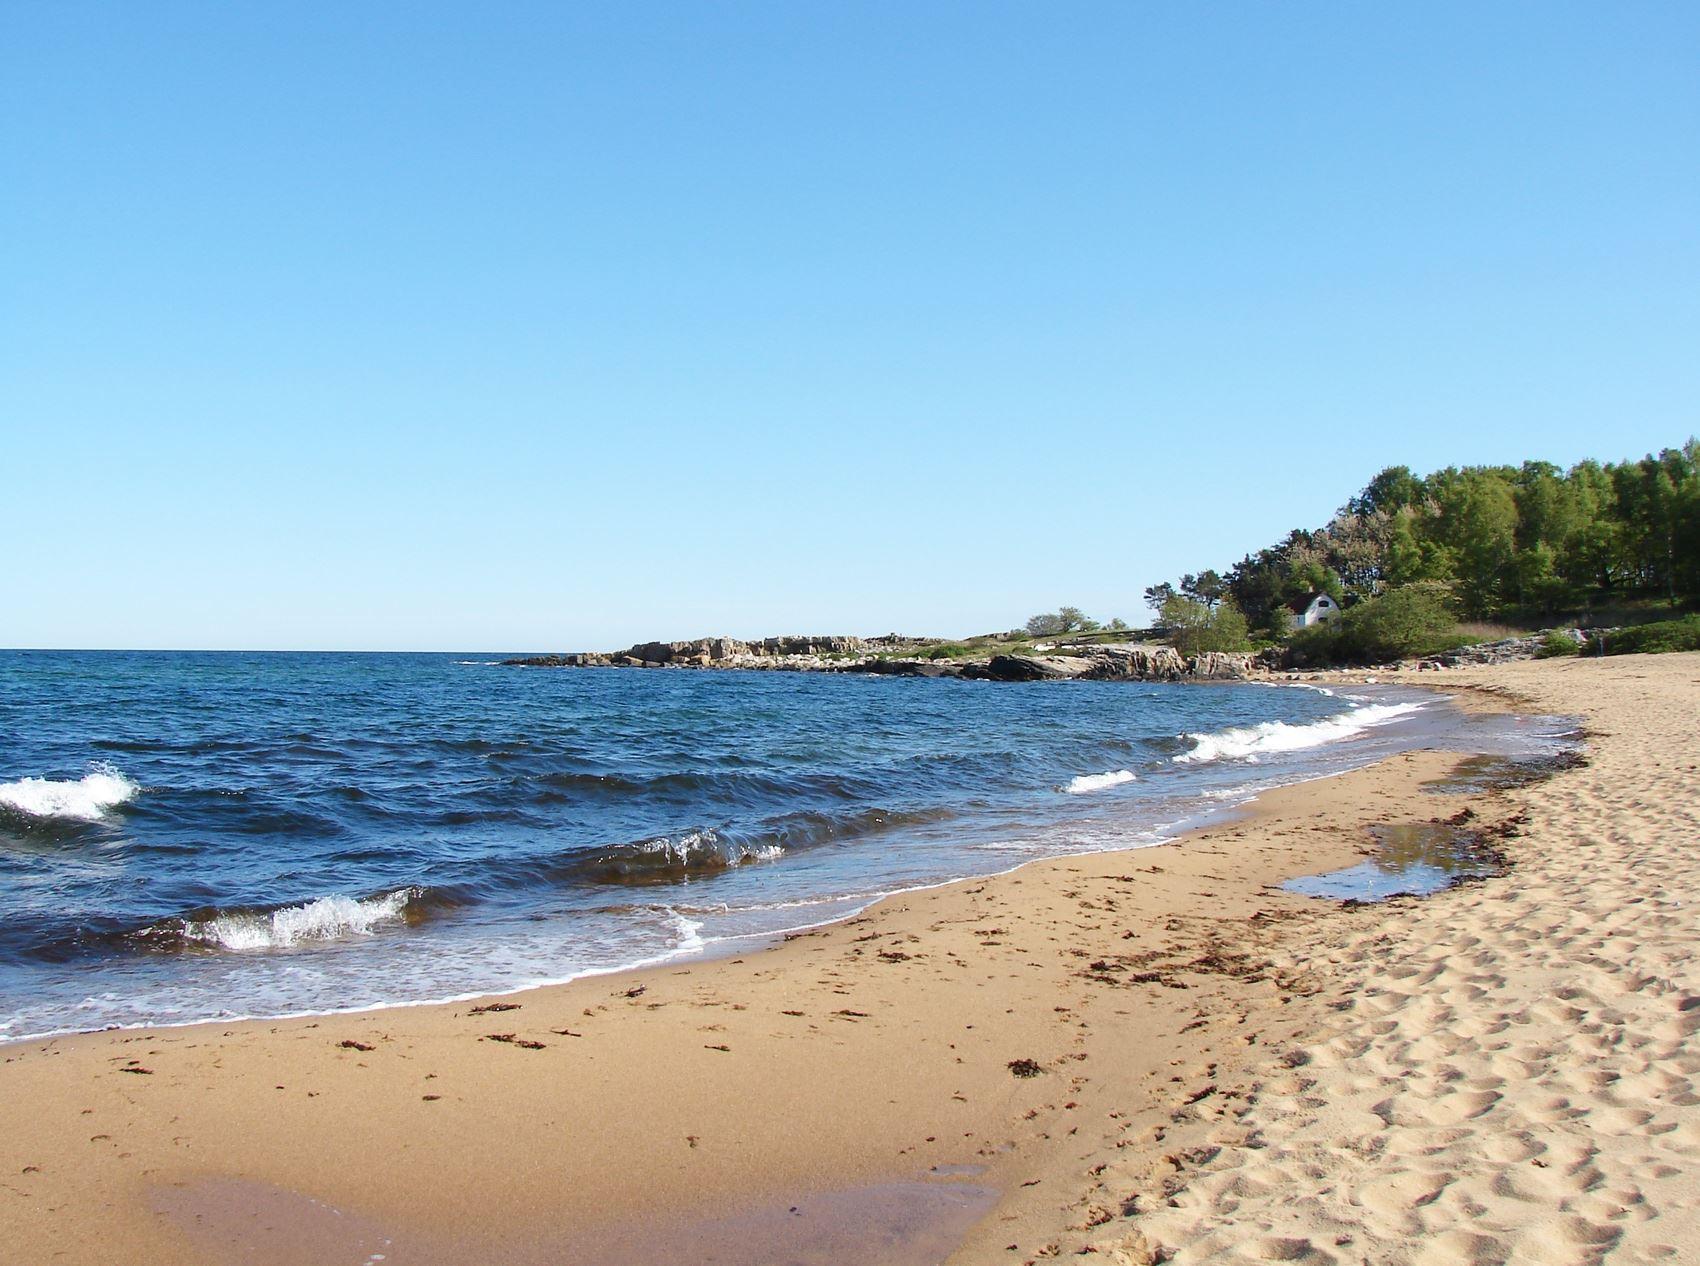 Beach - Tobisviksstrand